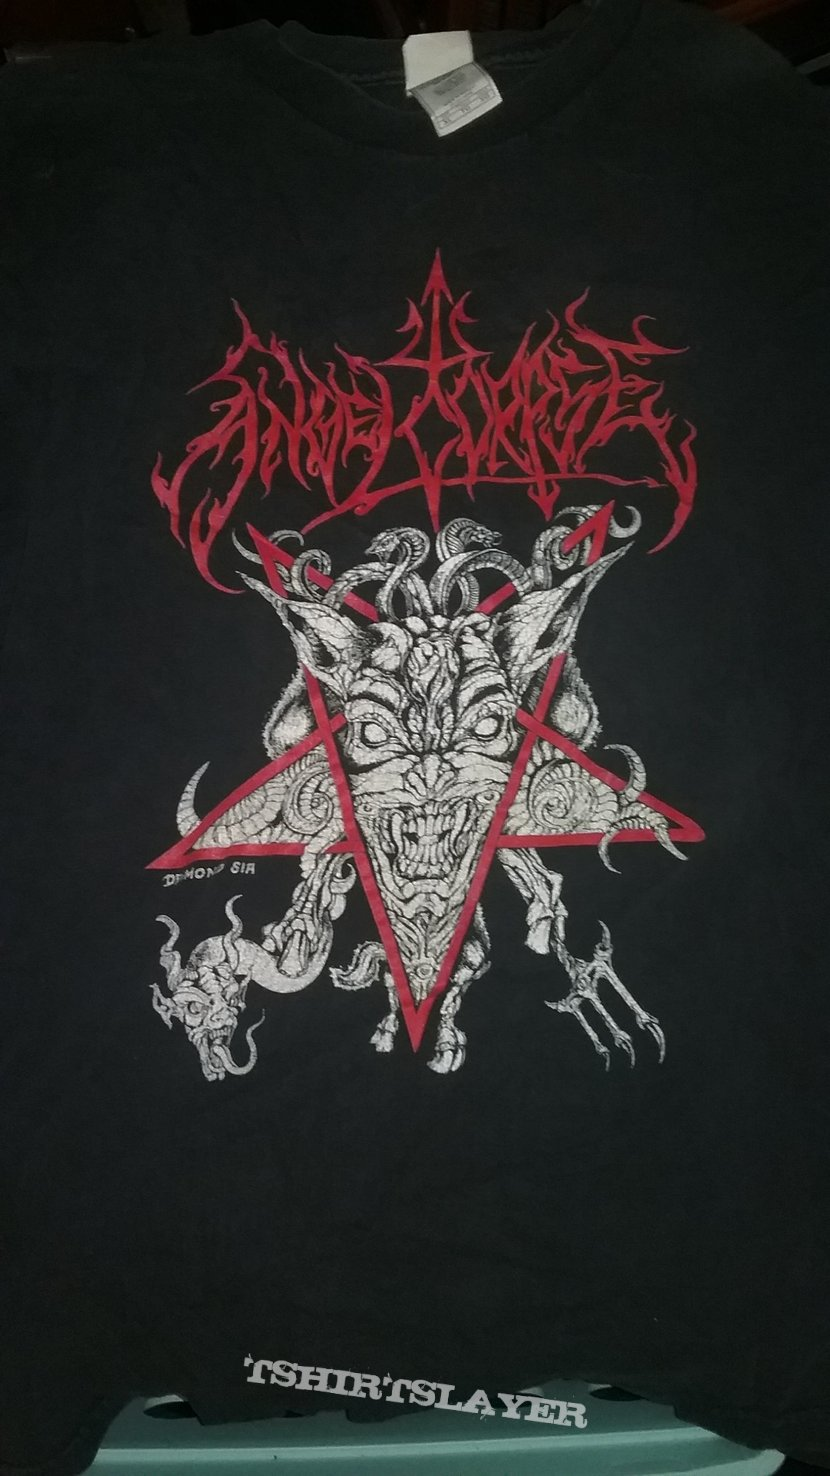 Angelcorpse - Iron, Blood and Blasphemy